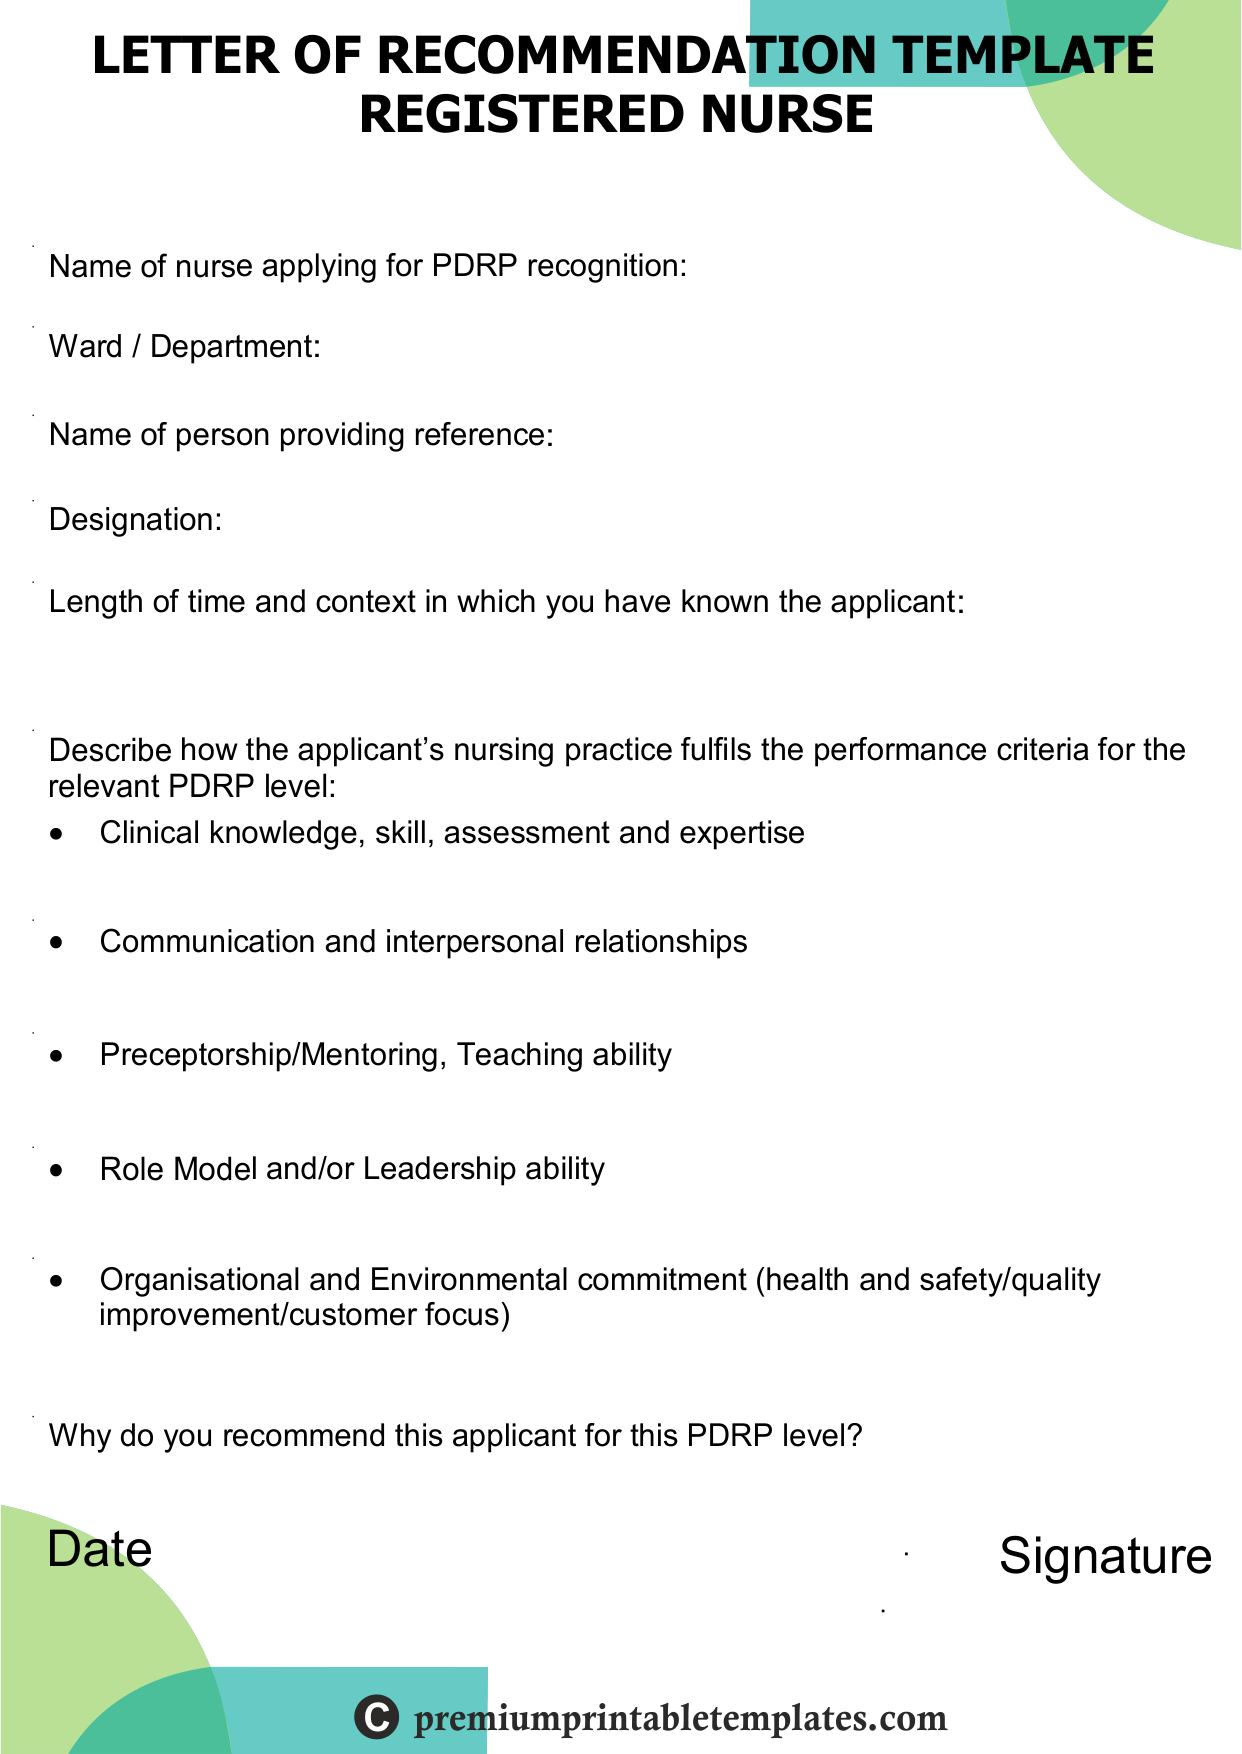 recommendation letter for registered nurse templates